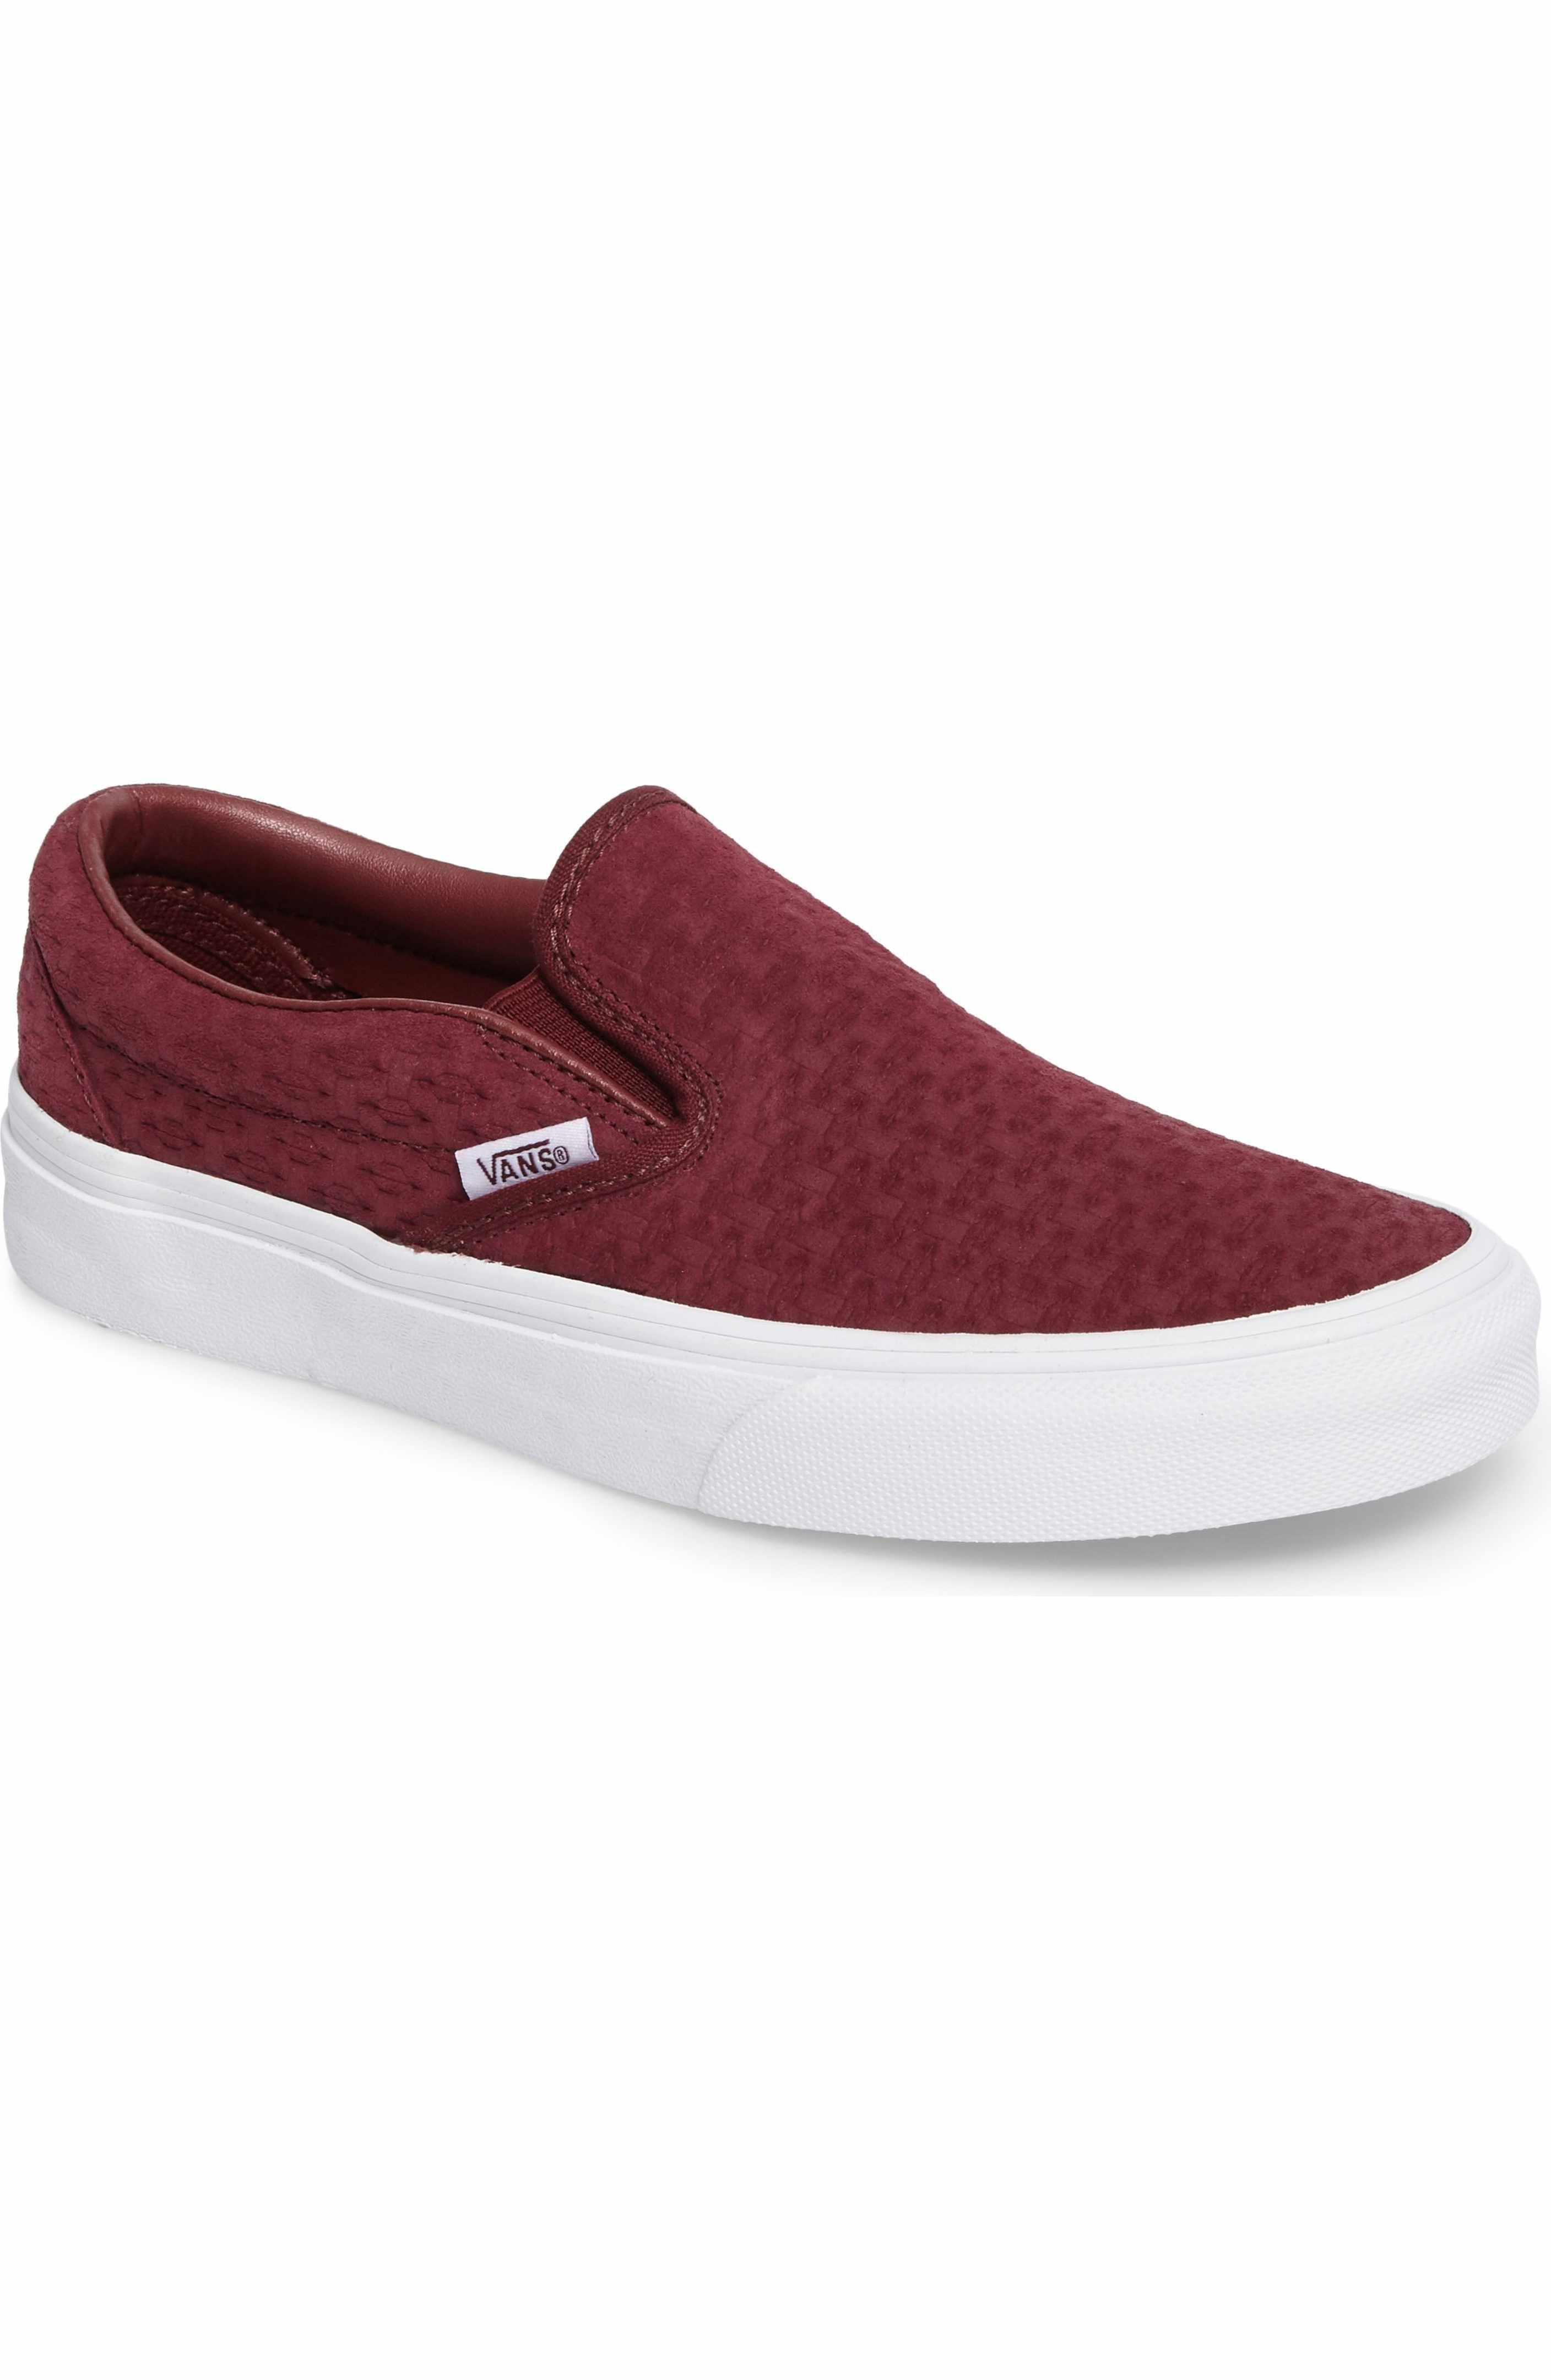 7fb79a7424 Classic Slip-On Sneaker. Sneakers WomenSlip On SneakersVans ShoesVans  Classic Slip OnClassic SneakersVans ClassicsShop VansBurgundyNordstrom